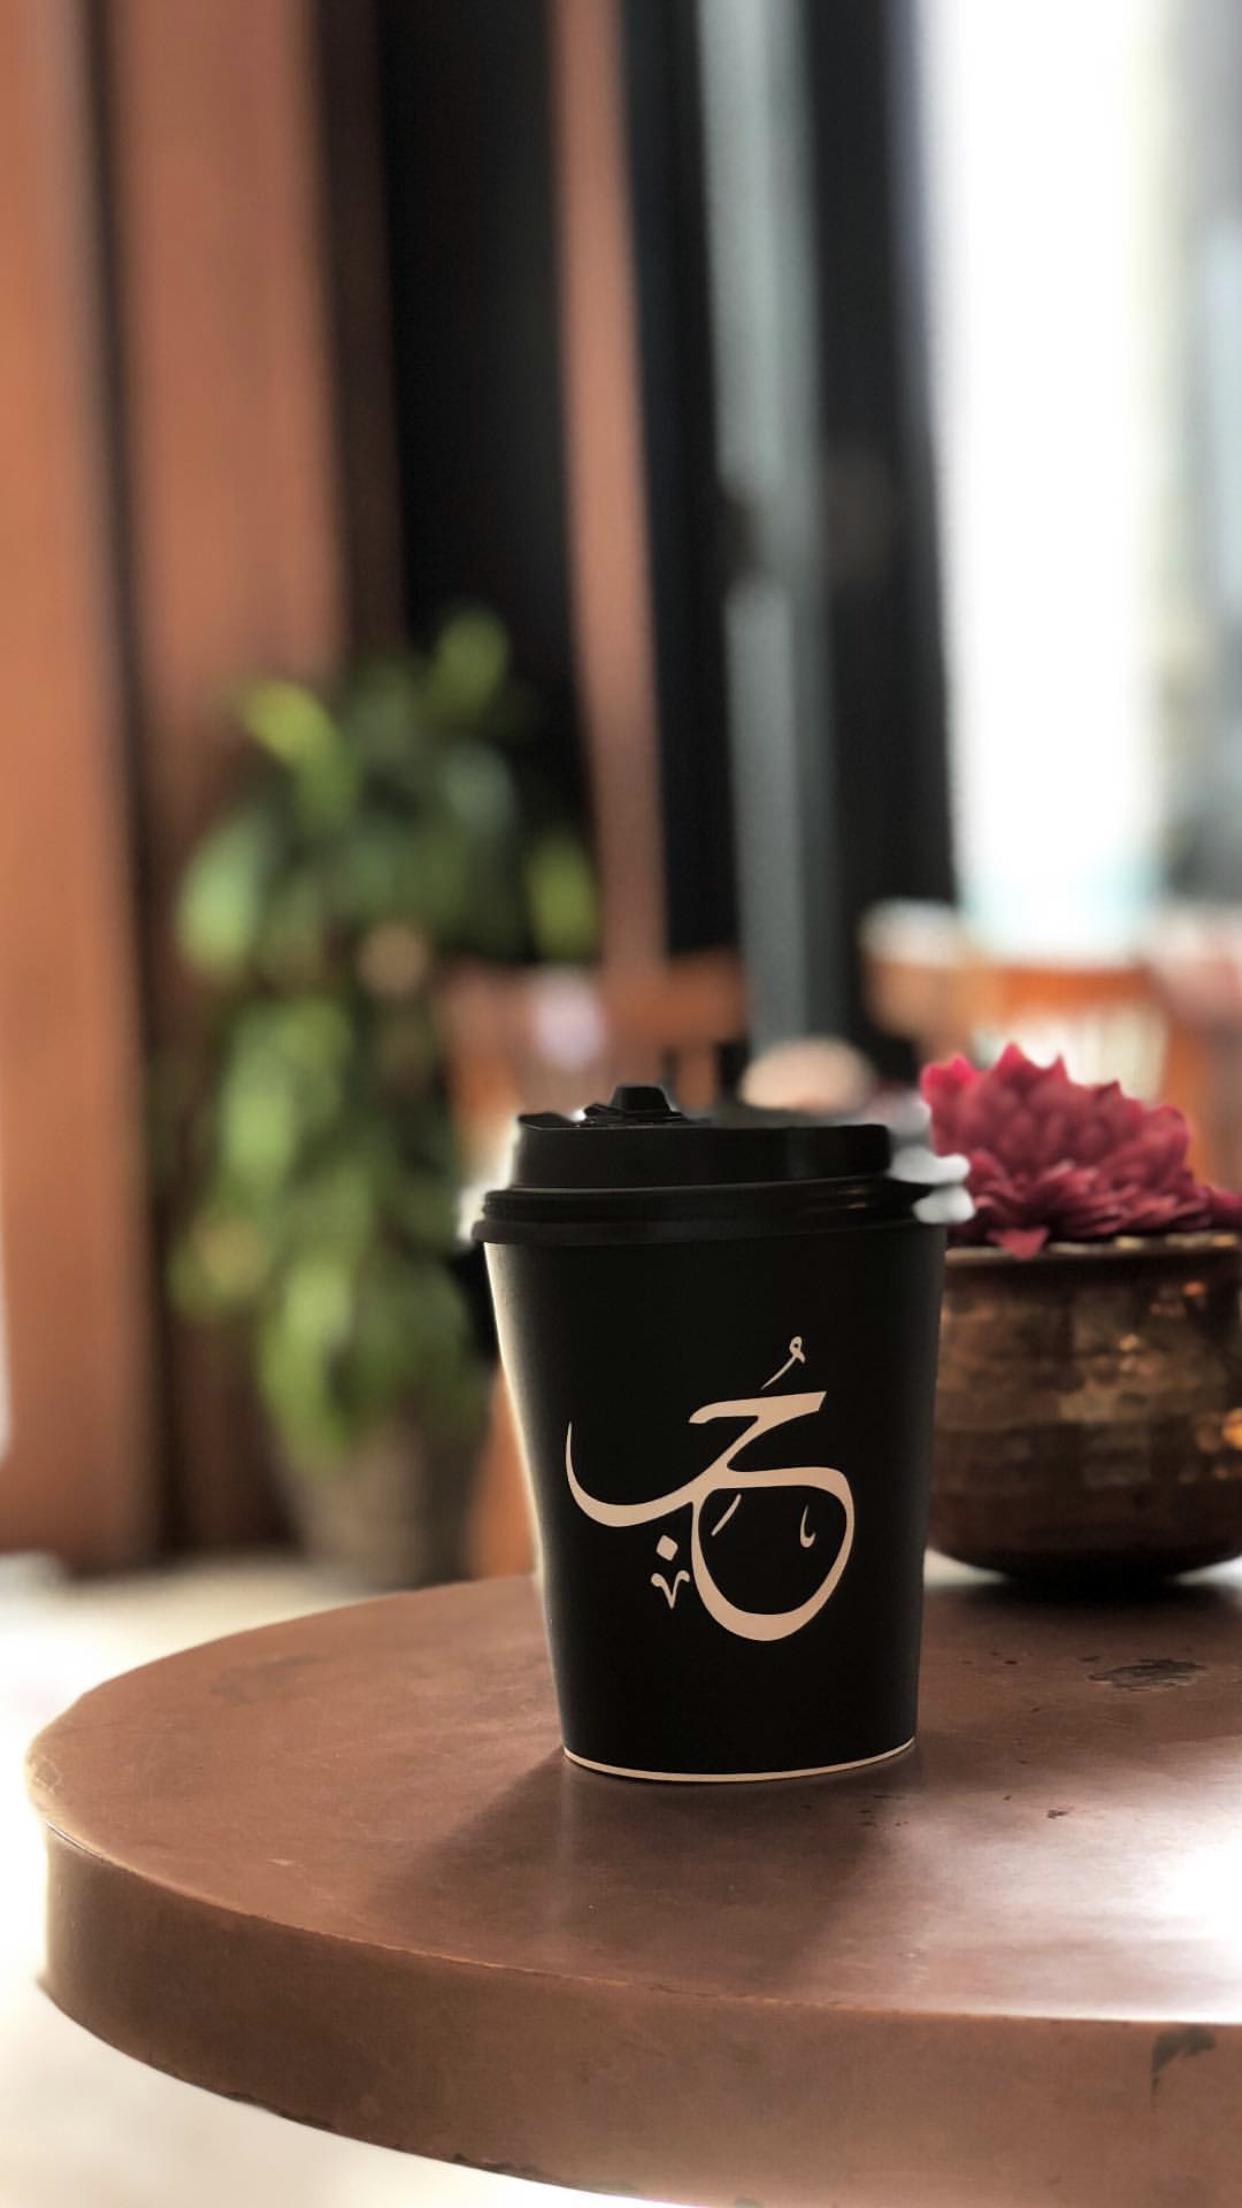 Pin By Duaa Alshomrani On مختارات موضي البليهد Coffee Latte Art Coffee Lover Coffee Photos